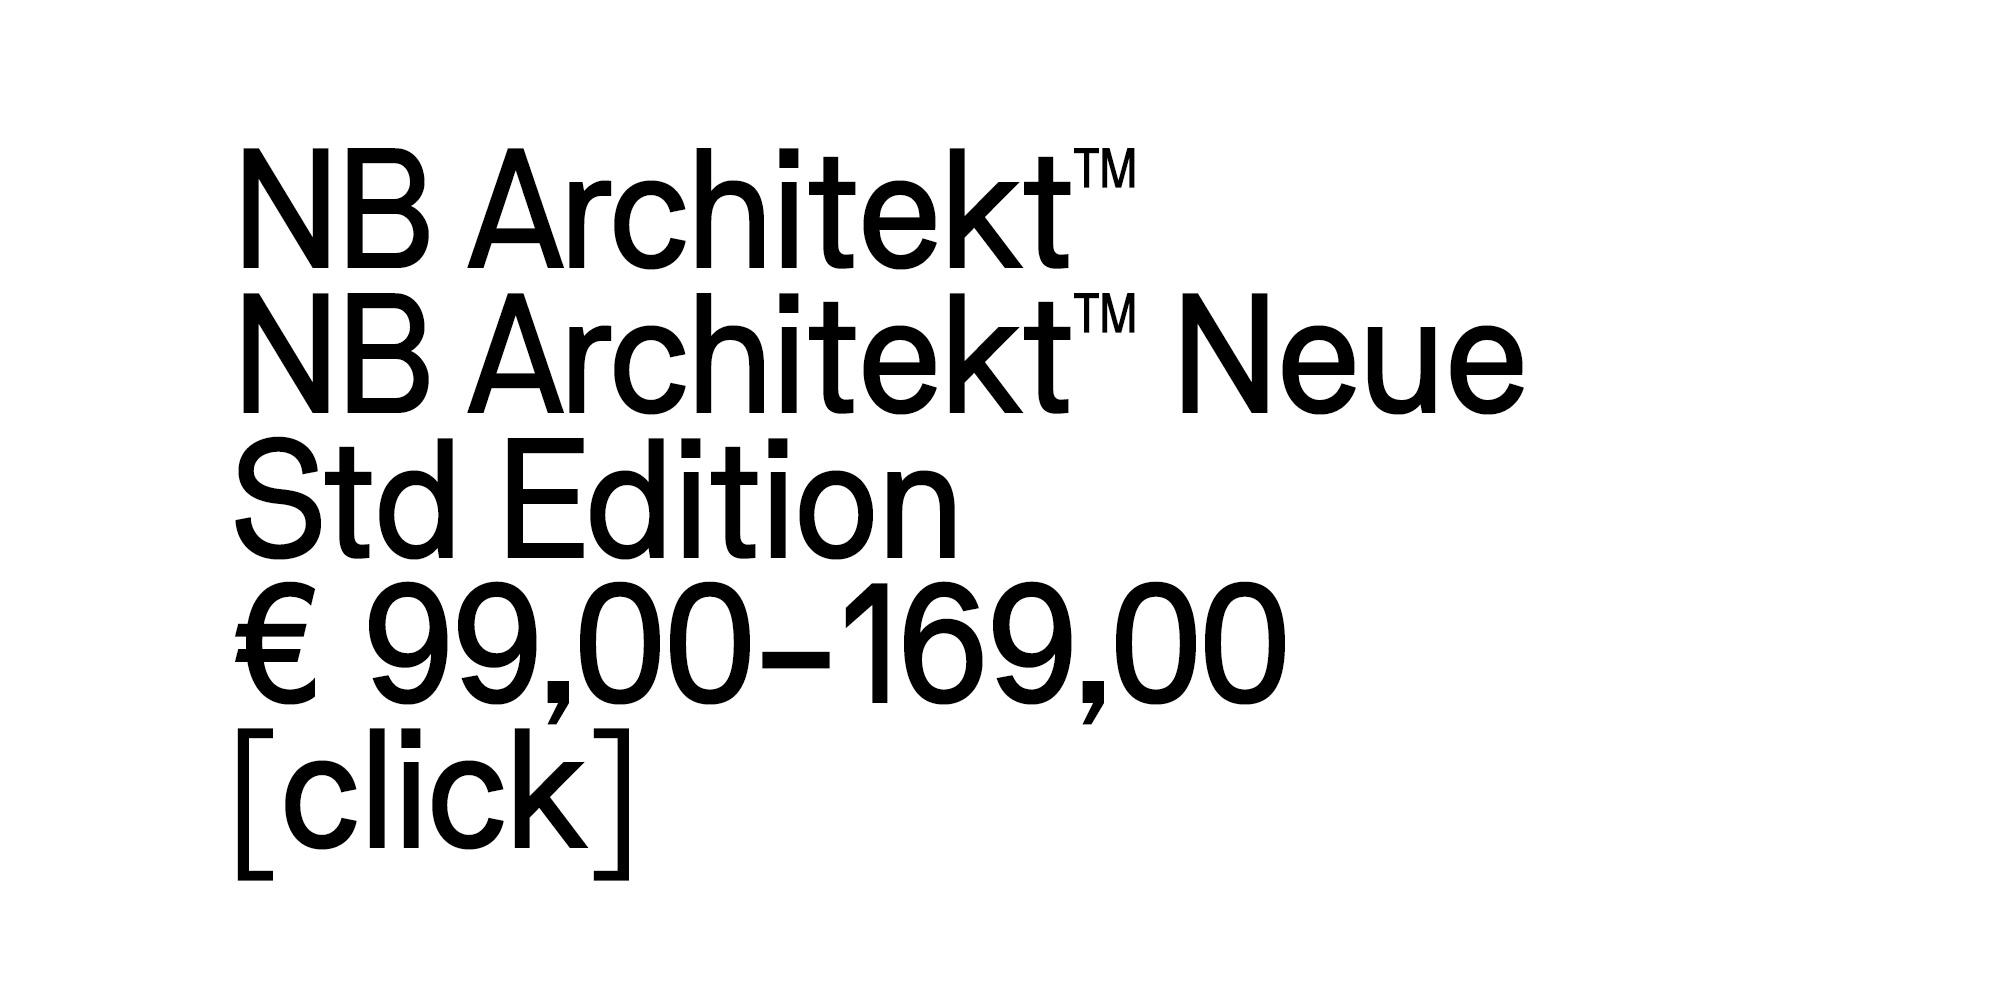 NBL-ArchitektNeueEd